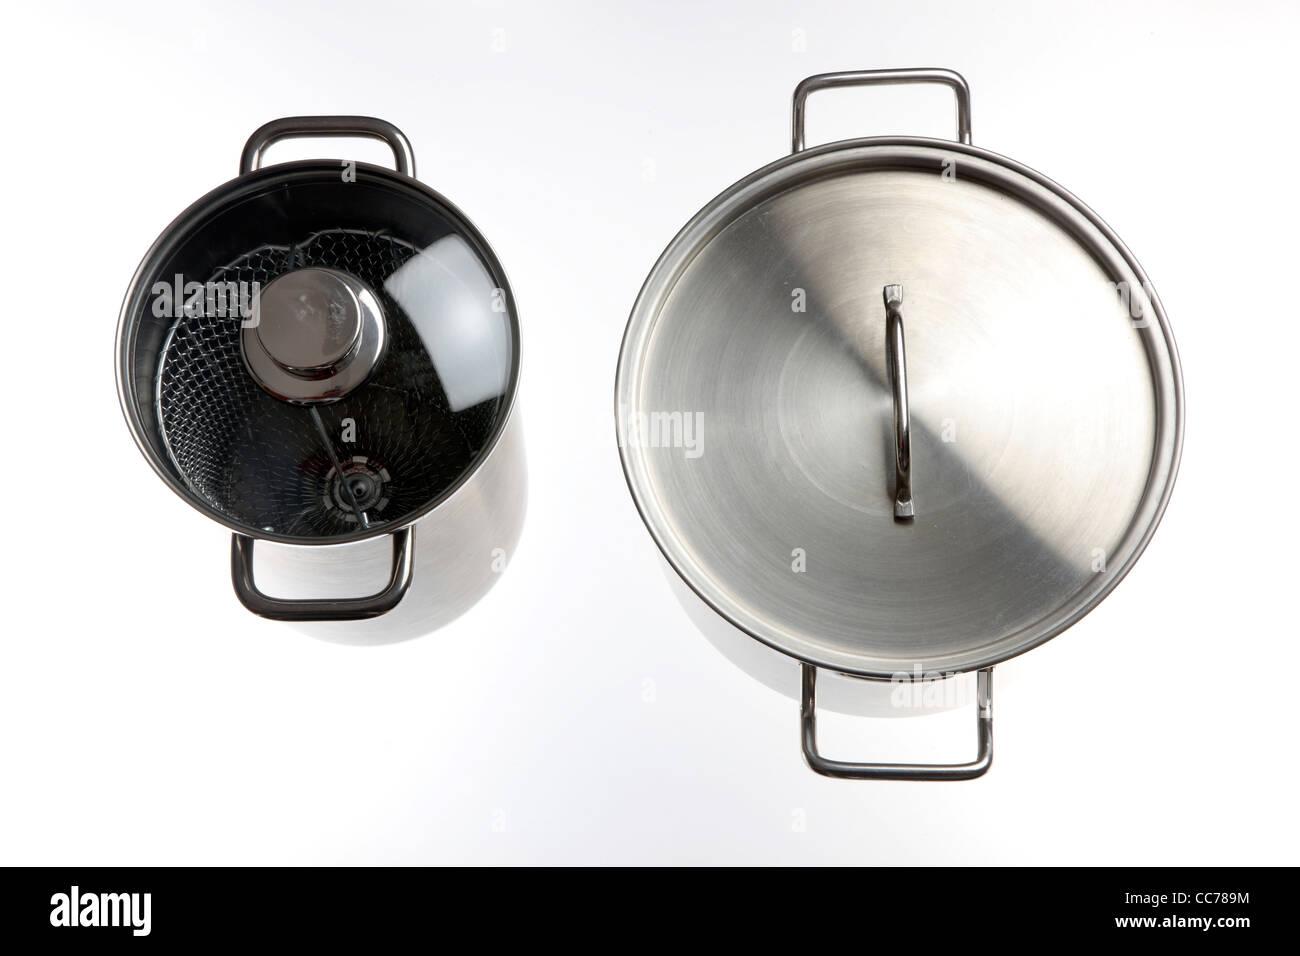 Compilation of various kitchen utensils, kitchen tools. Pots. - Stock Image